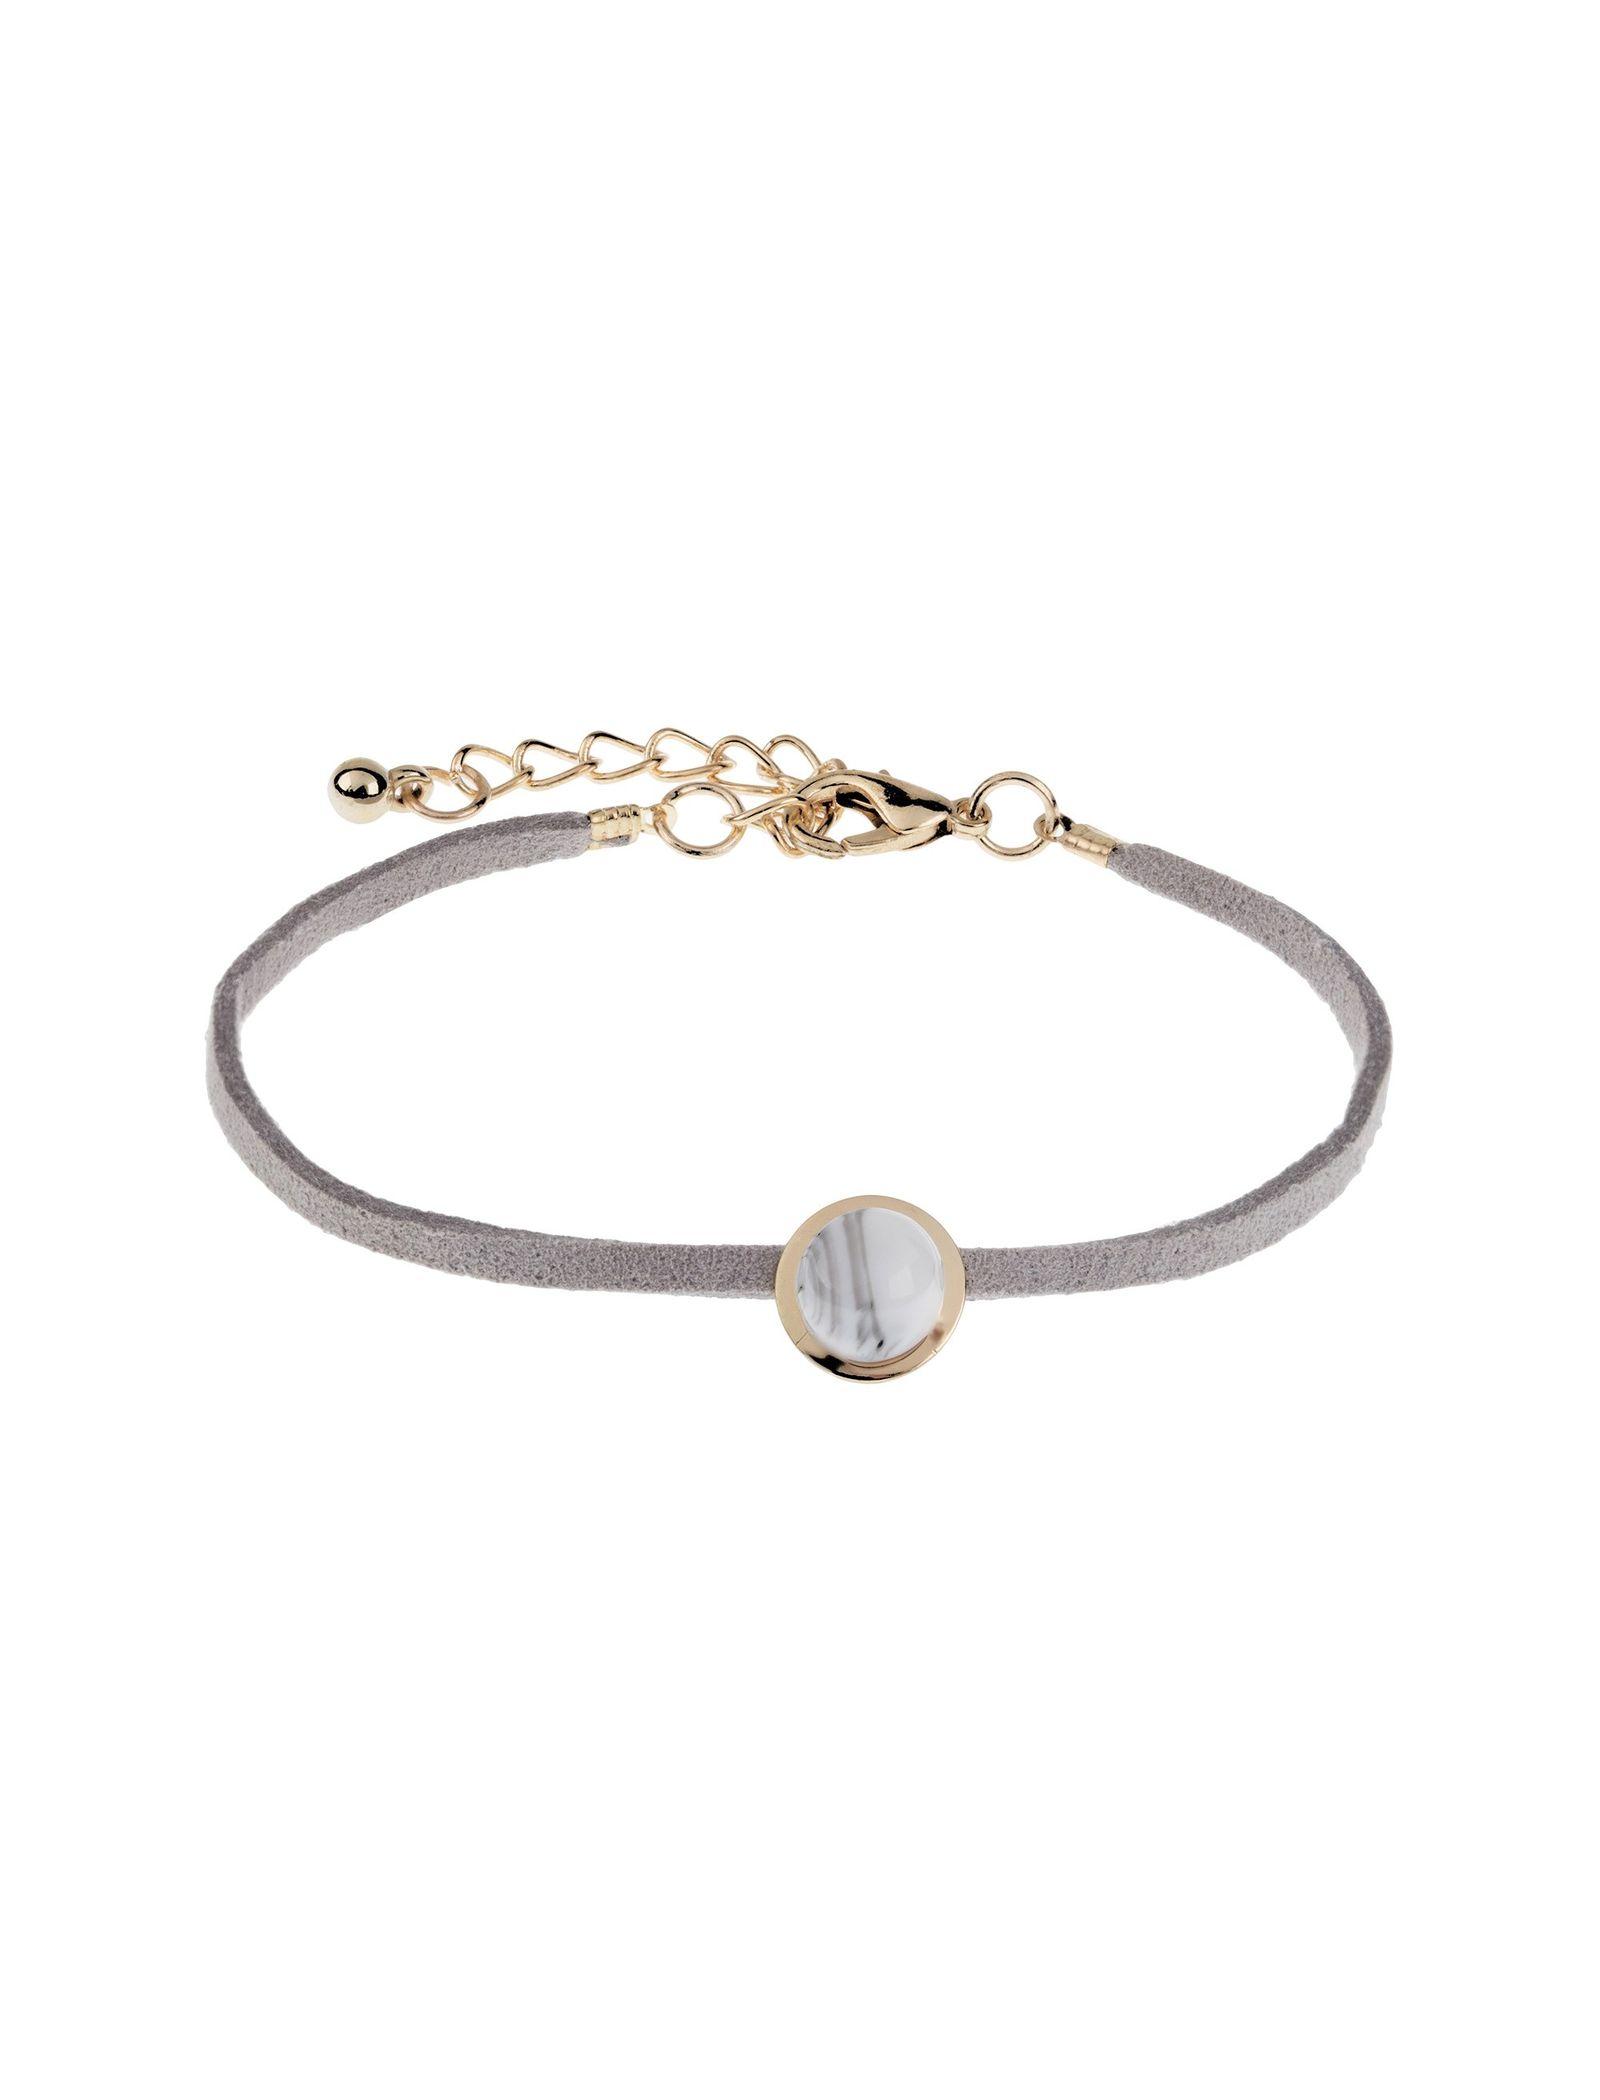 دستبند زنانه بسته 3 عددی - کوتون - طلايي/ طوسي - 6